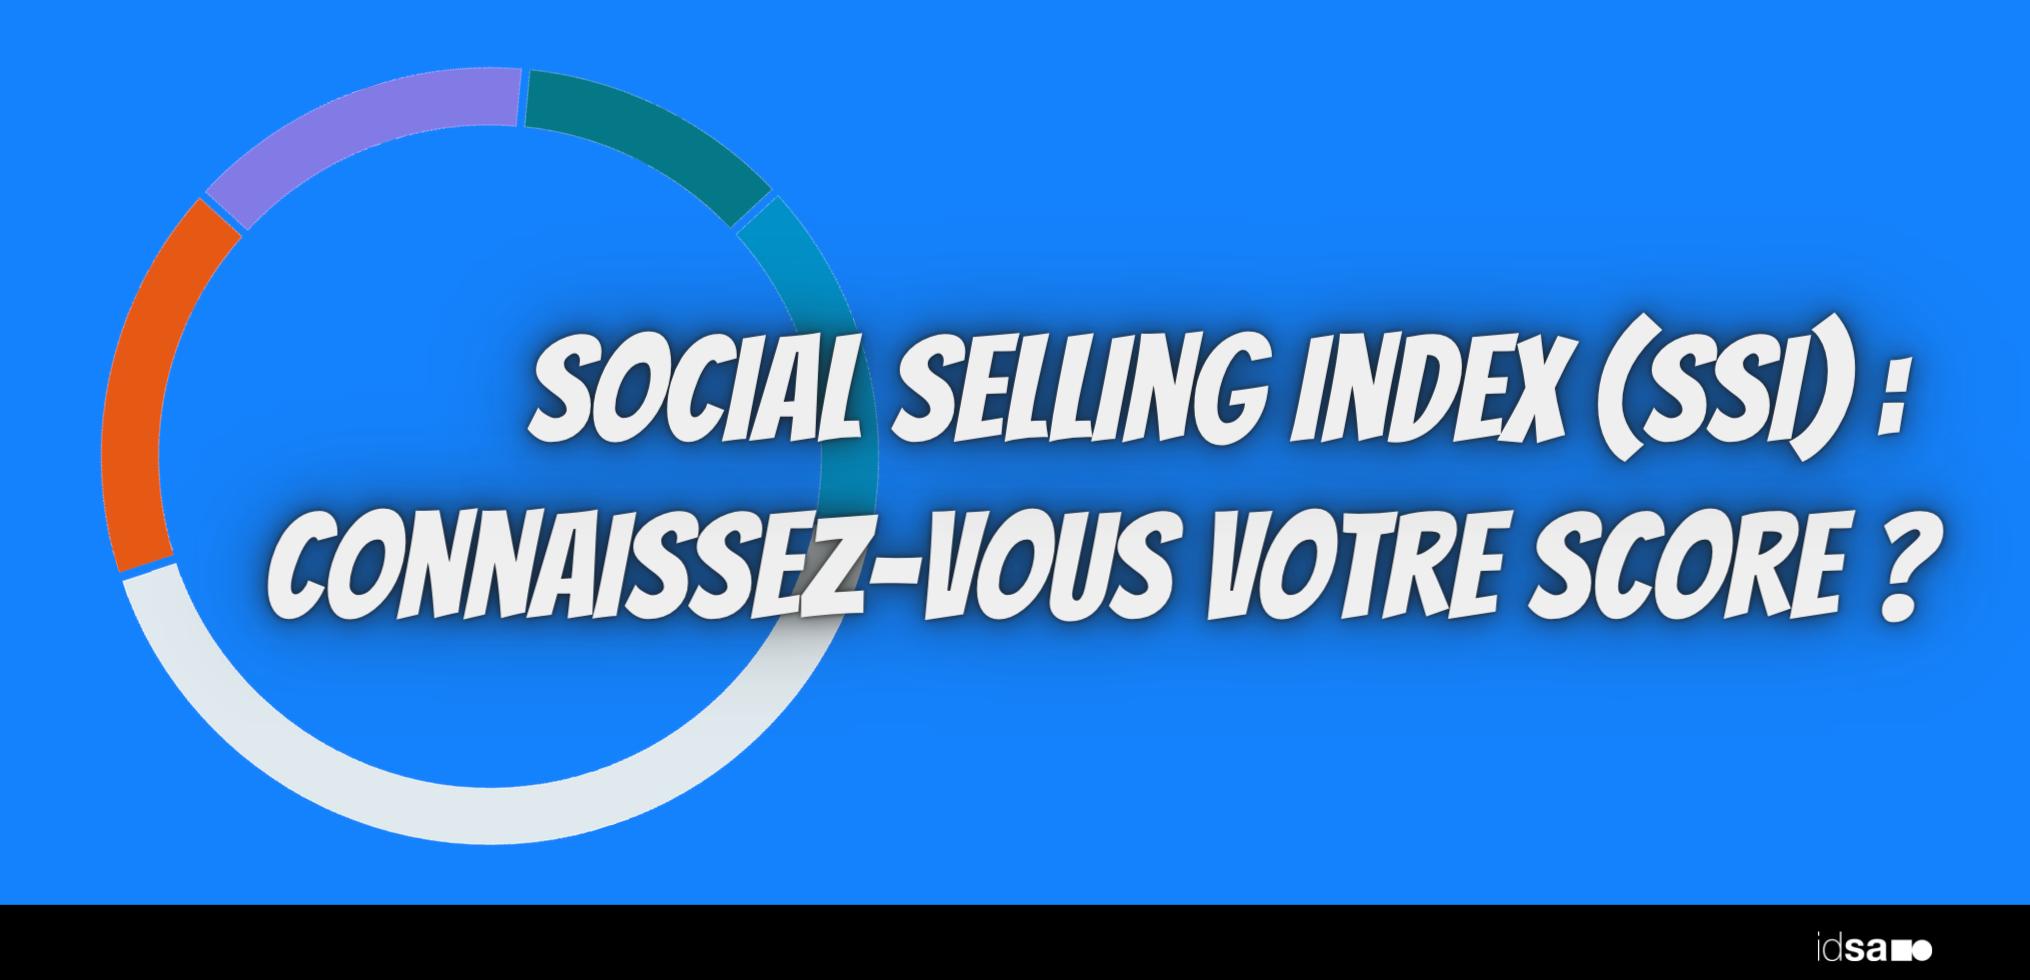 social-selling-index-SSI-score-linkedin-idsa